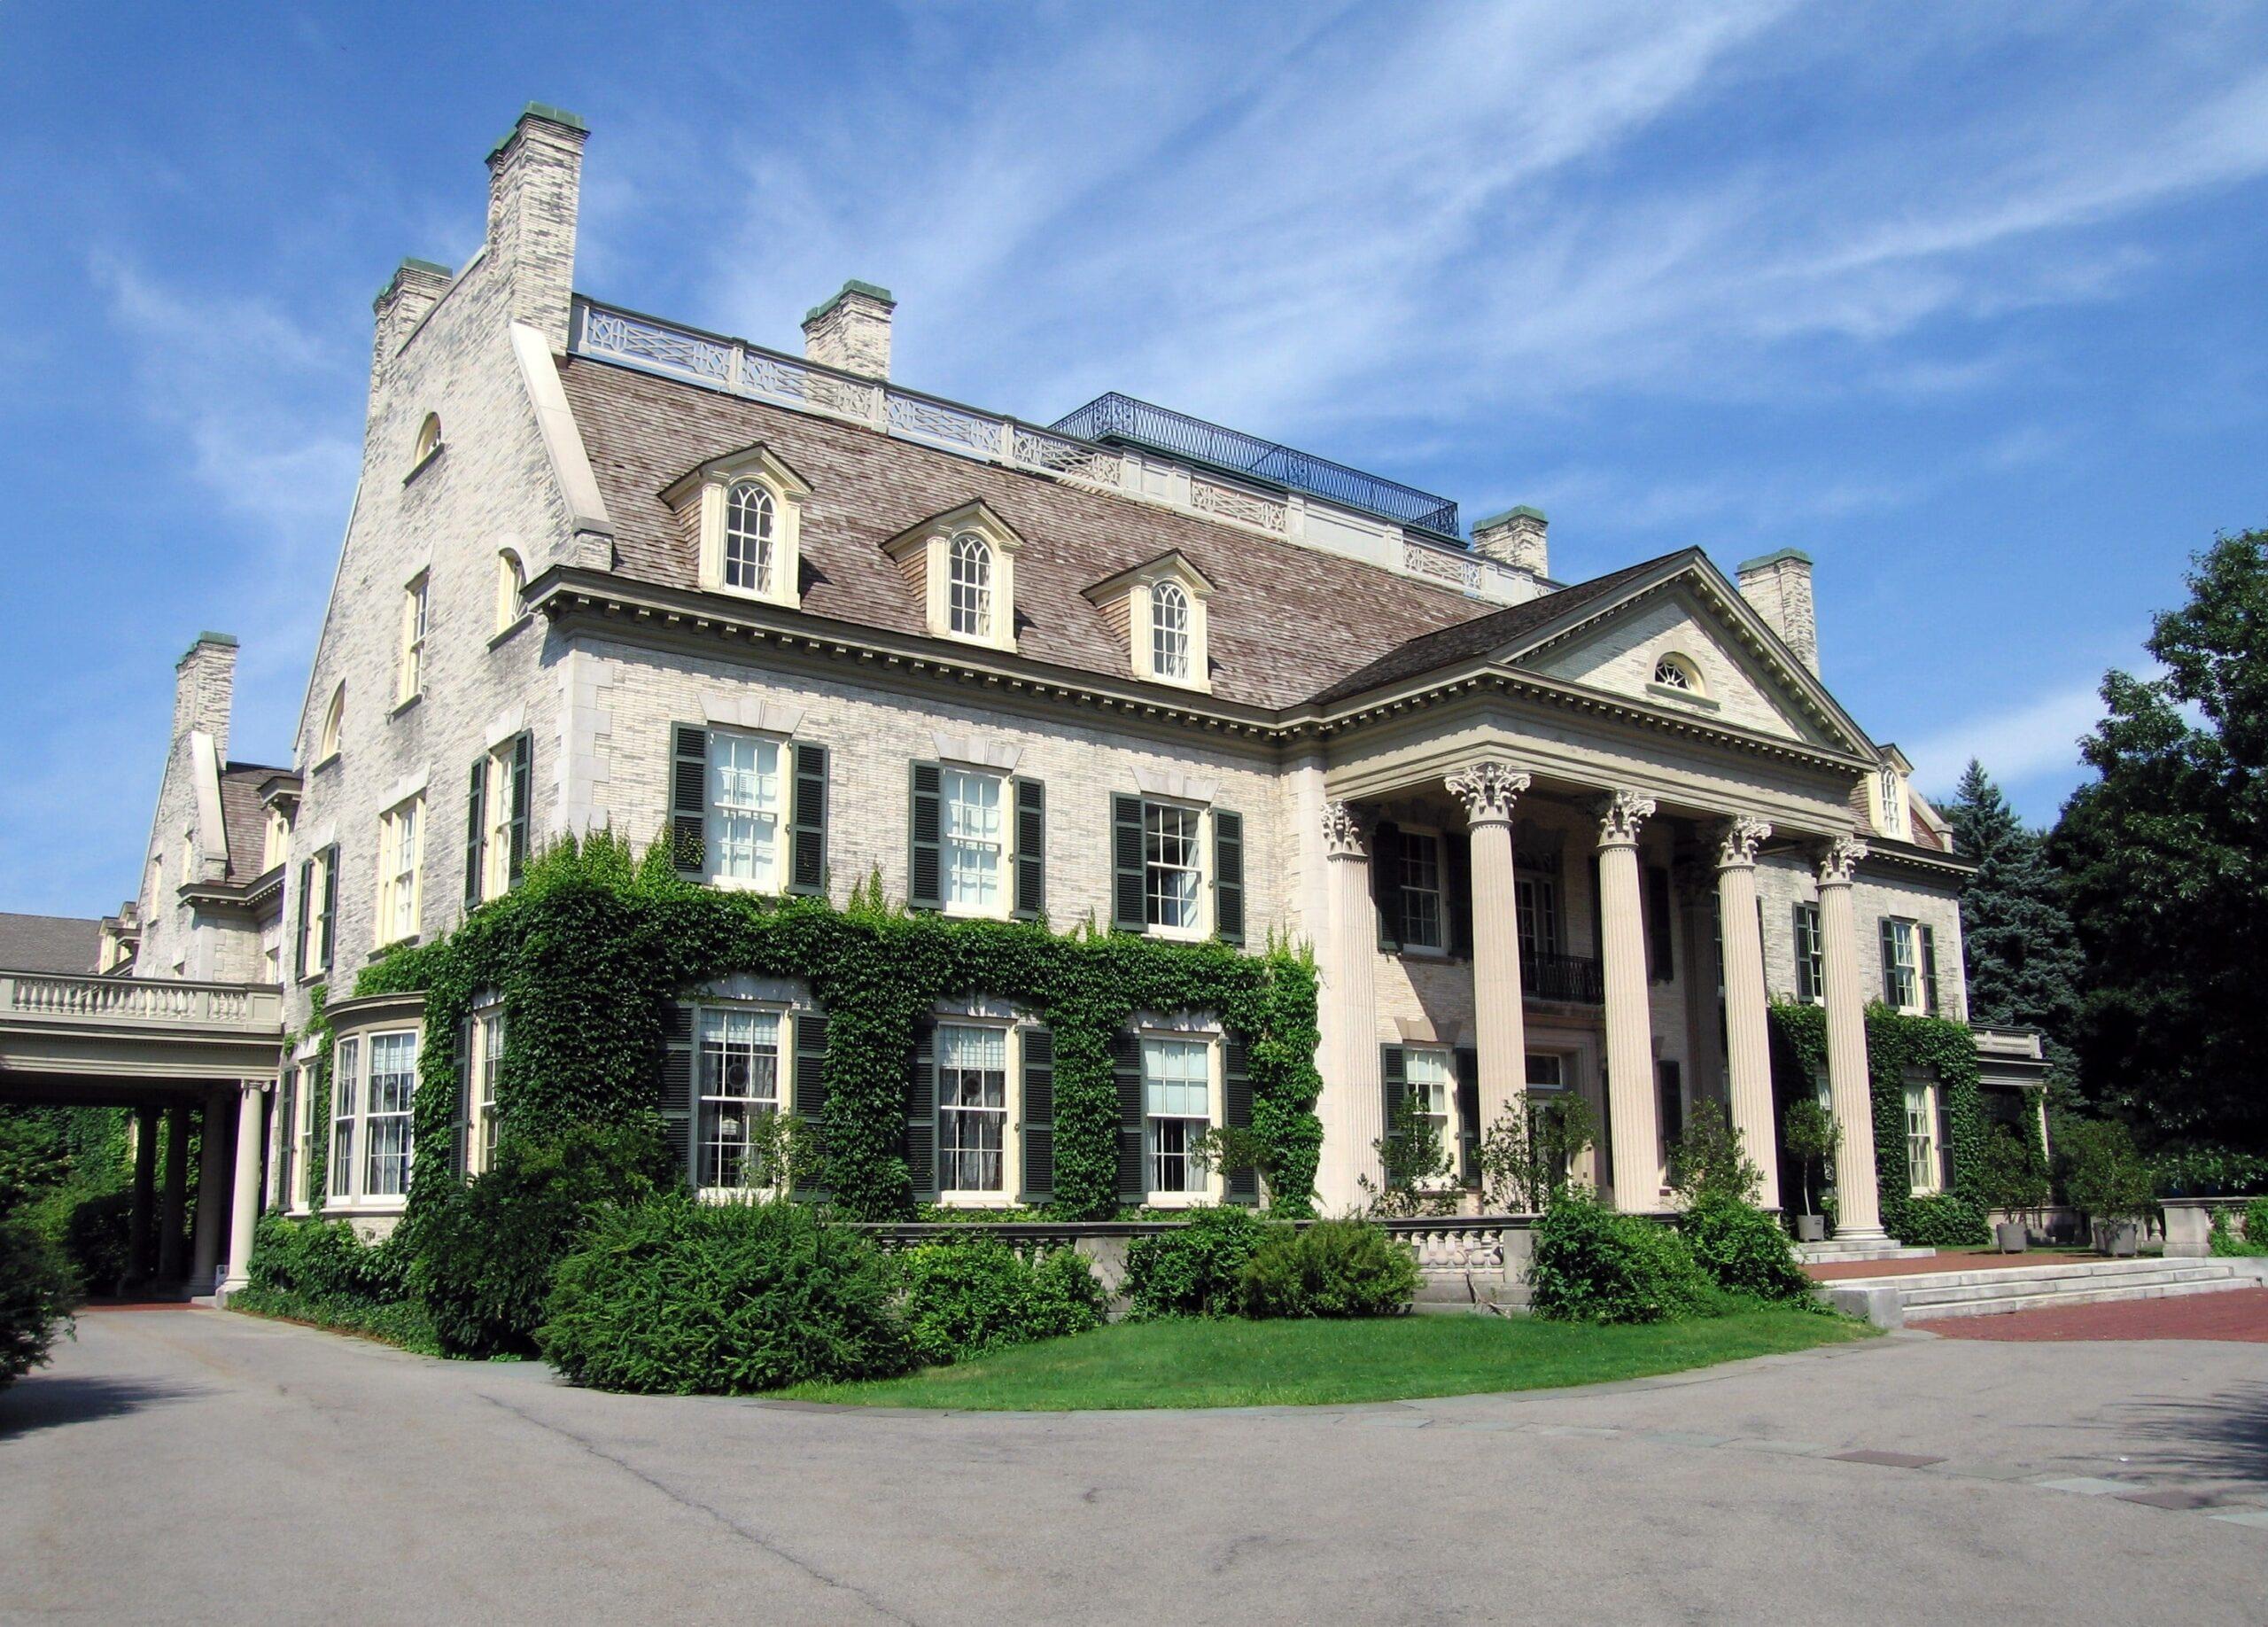 georgeeastmanhouse scaled